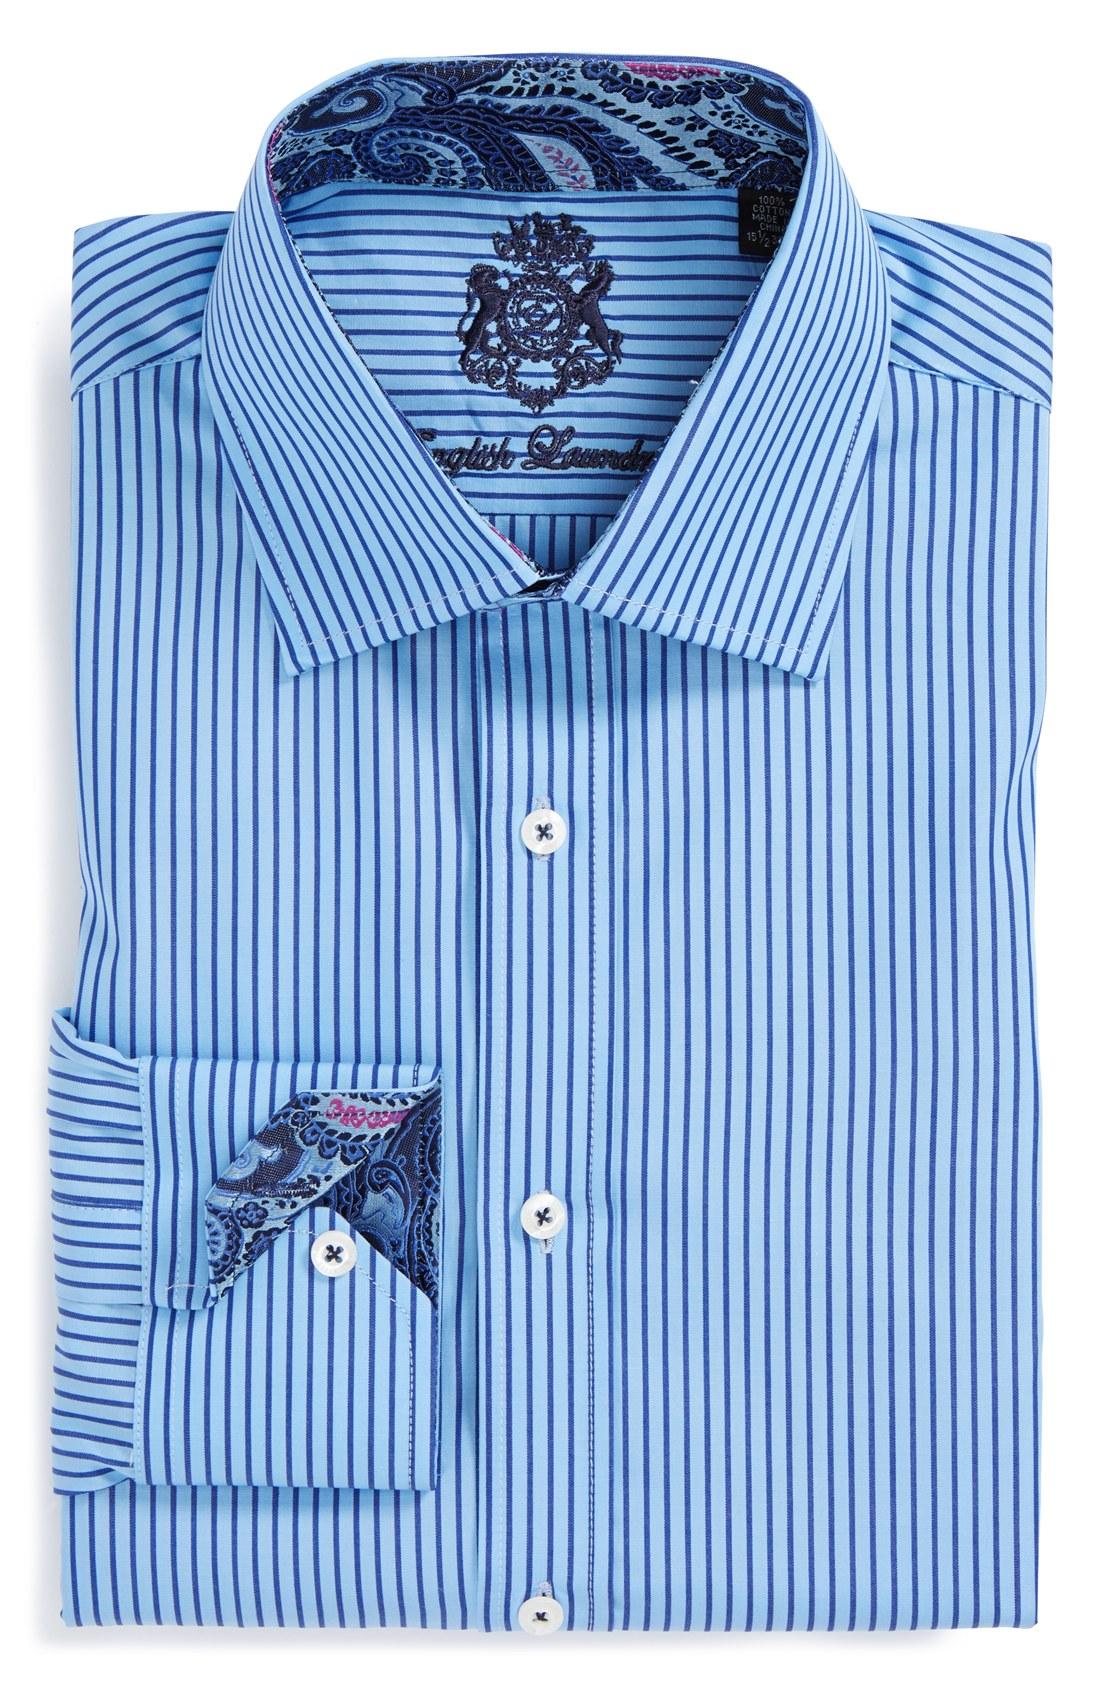 English laundry english laundry trim fit stripe dress for 17 33 shirt size